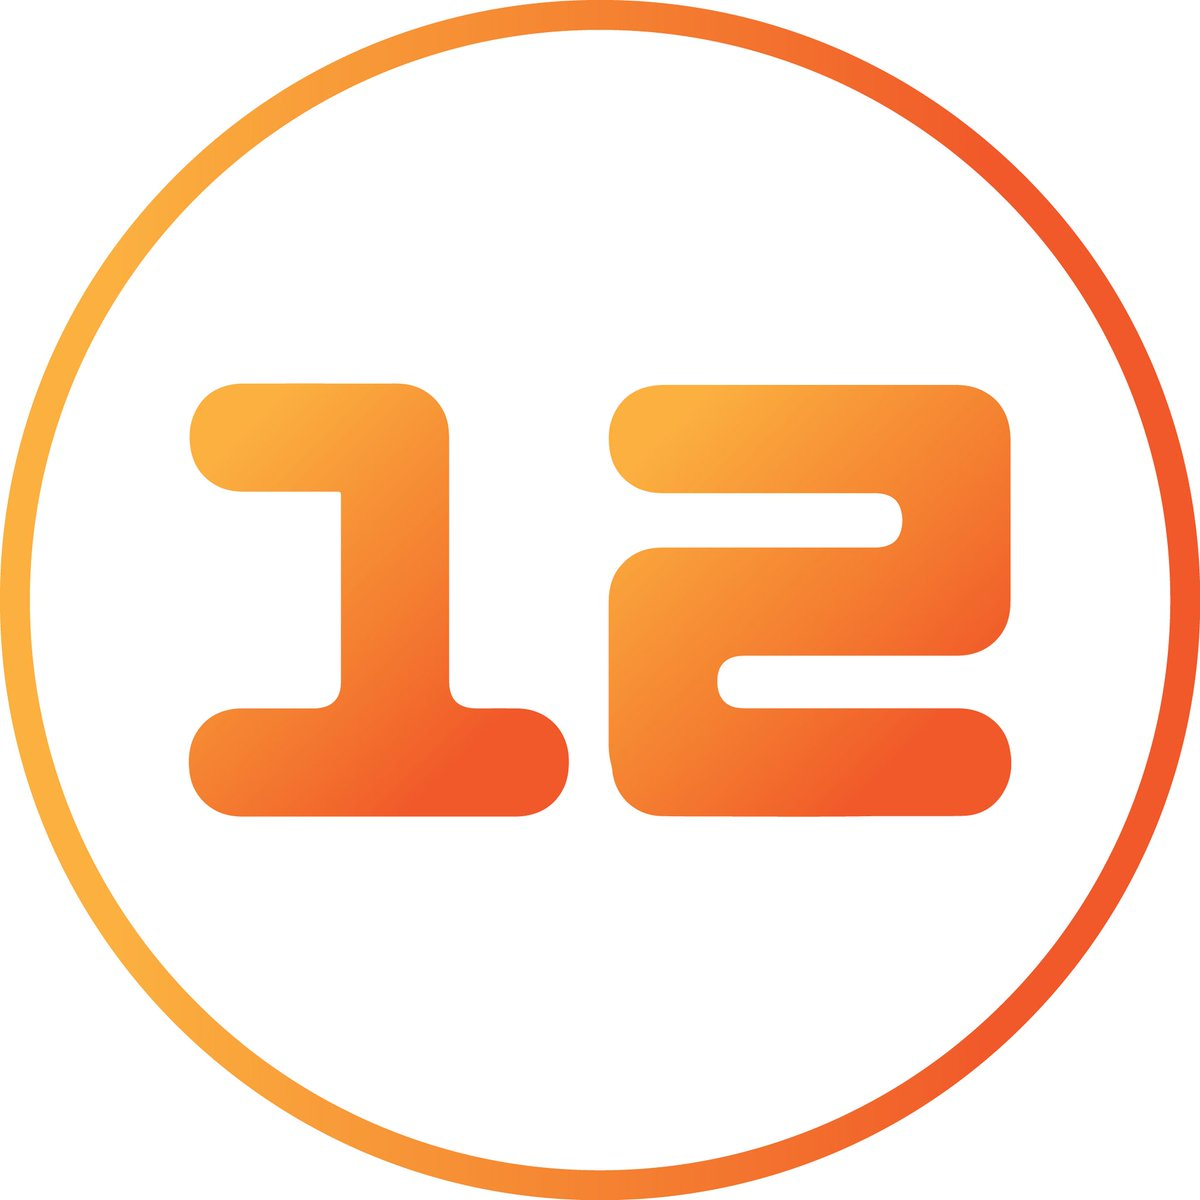 программа телеканала 1 1 на вчера